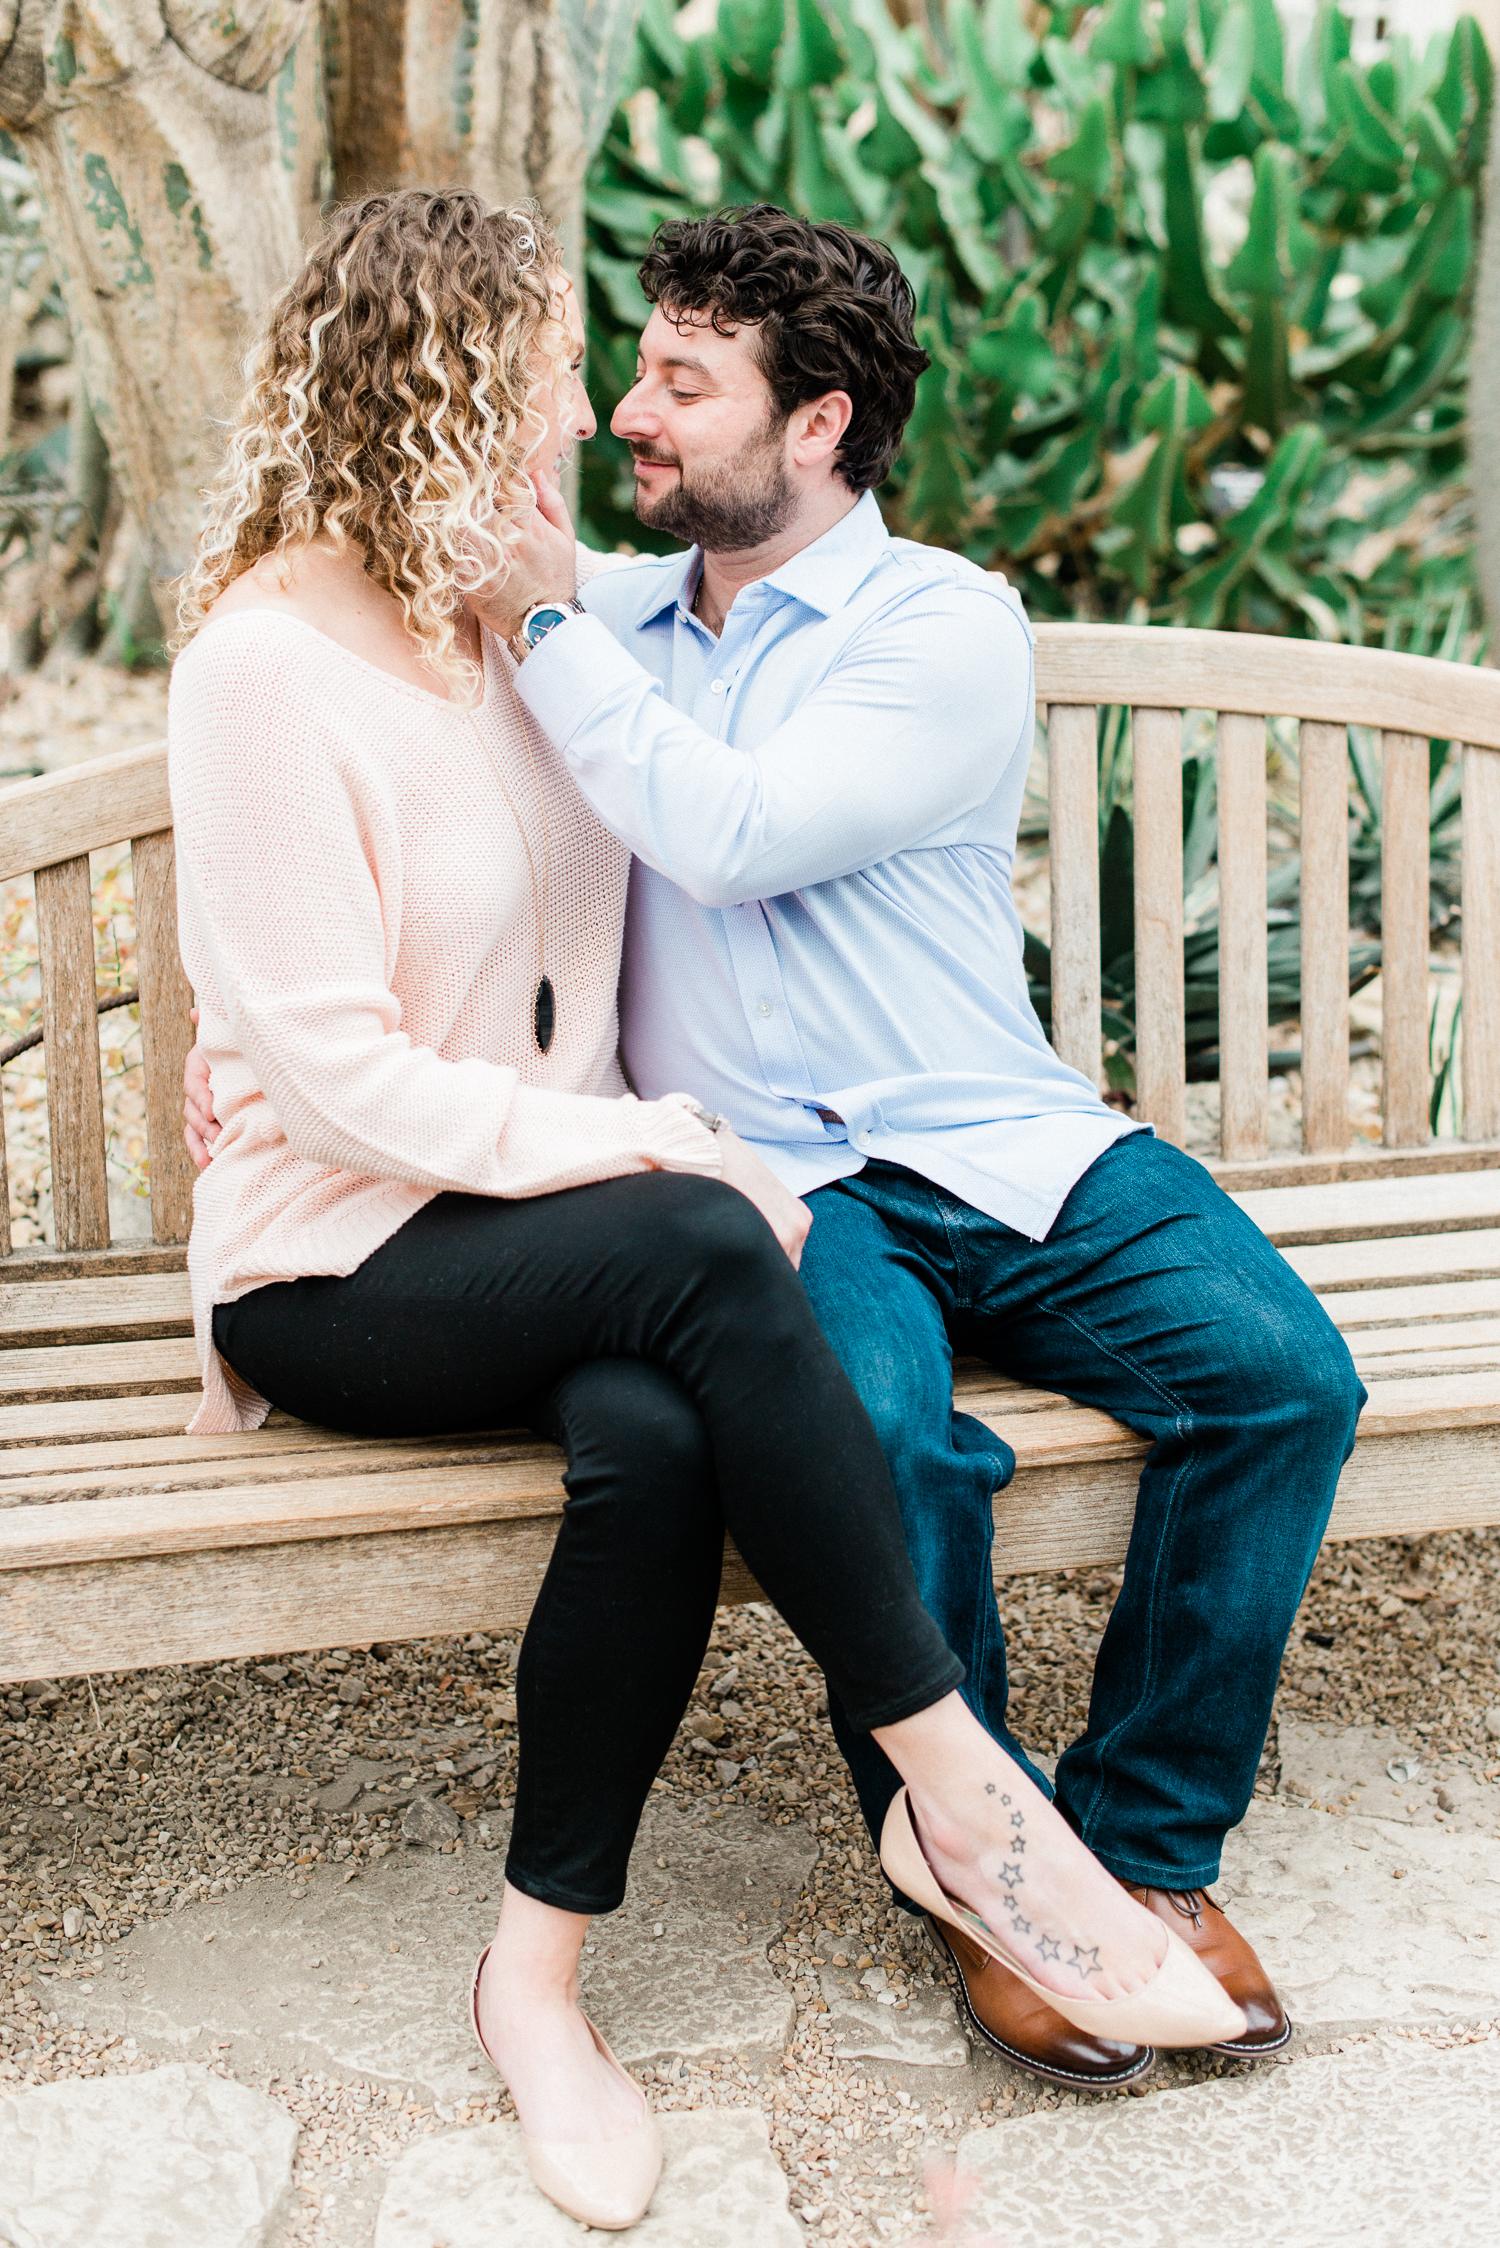 Brittany Bekas - Garfield Park Conservatory Chicago Engagement Photos-9.jpg